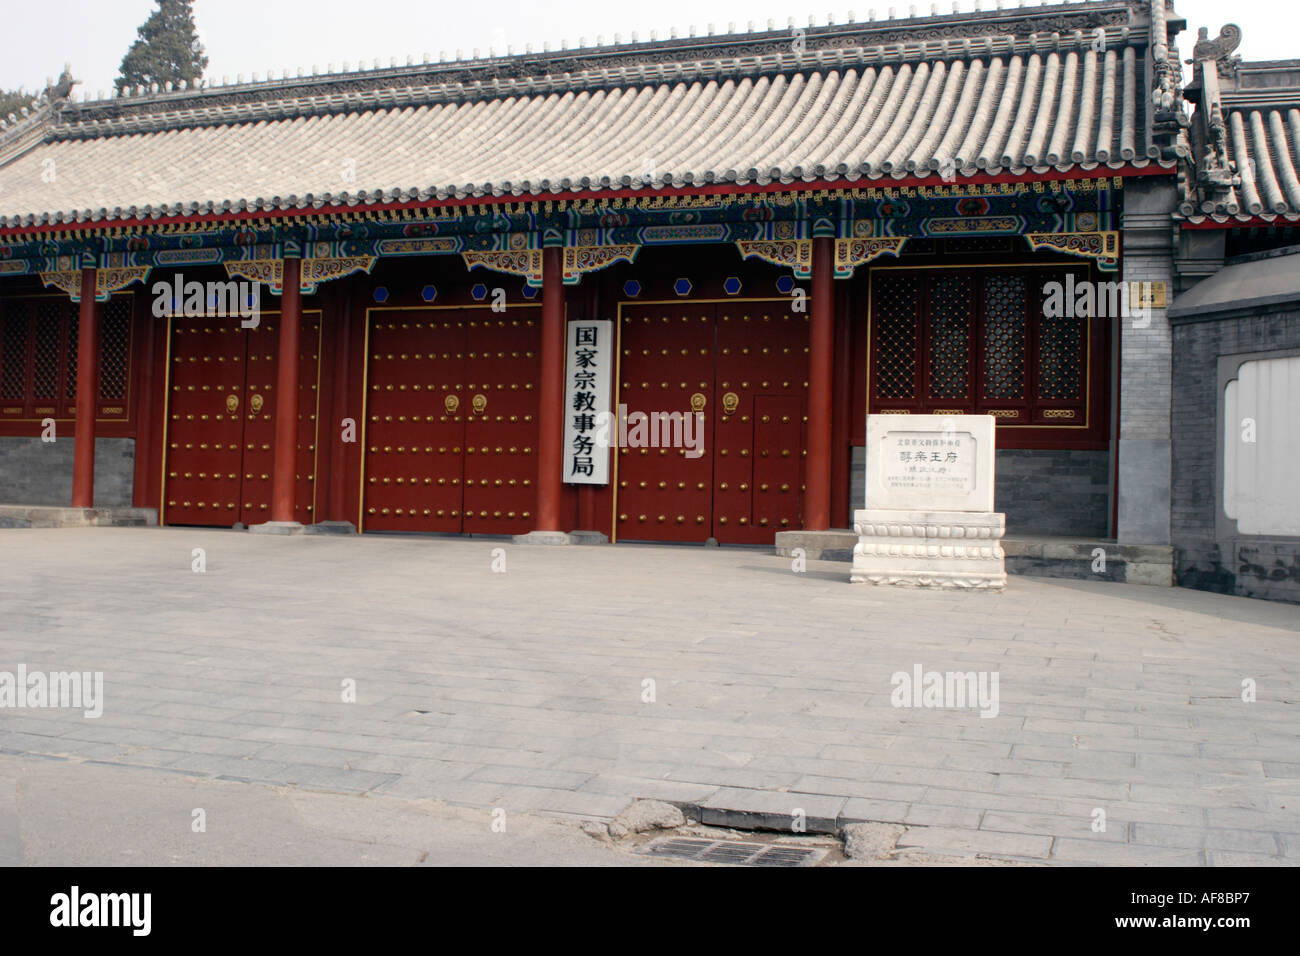 Prince Chun's Mansion, Beijing China - Stock Image